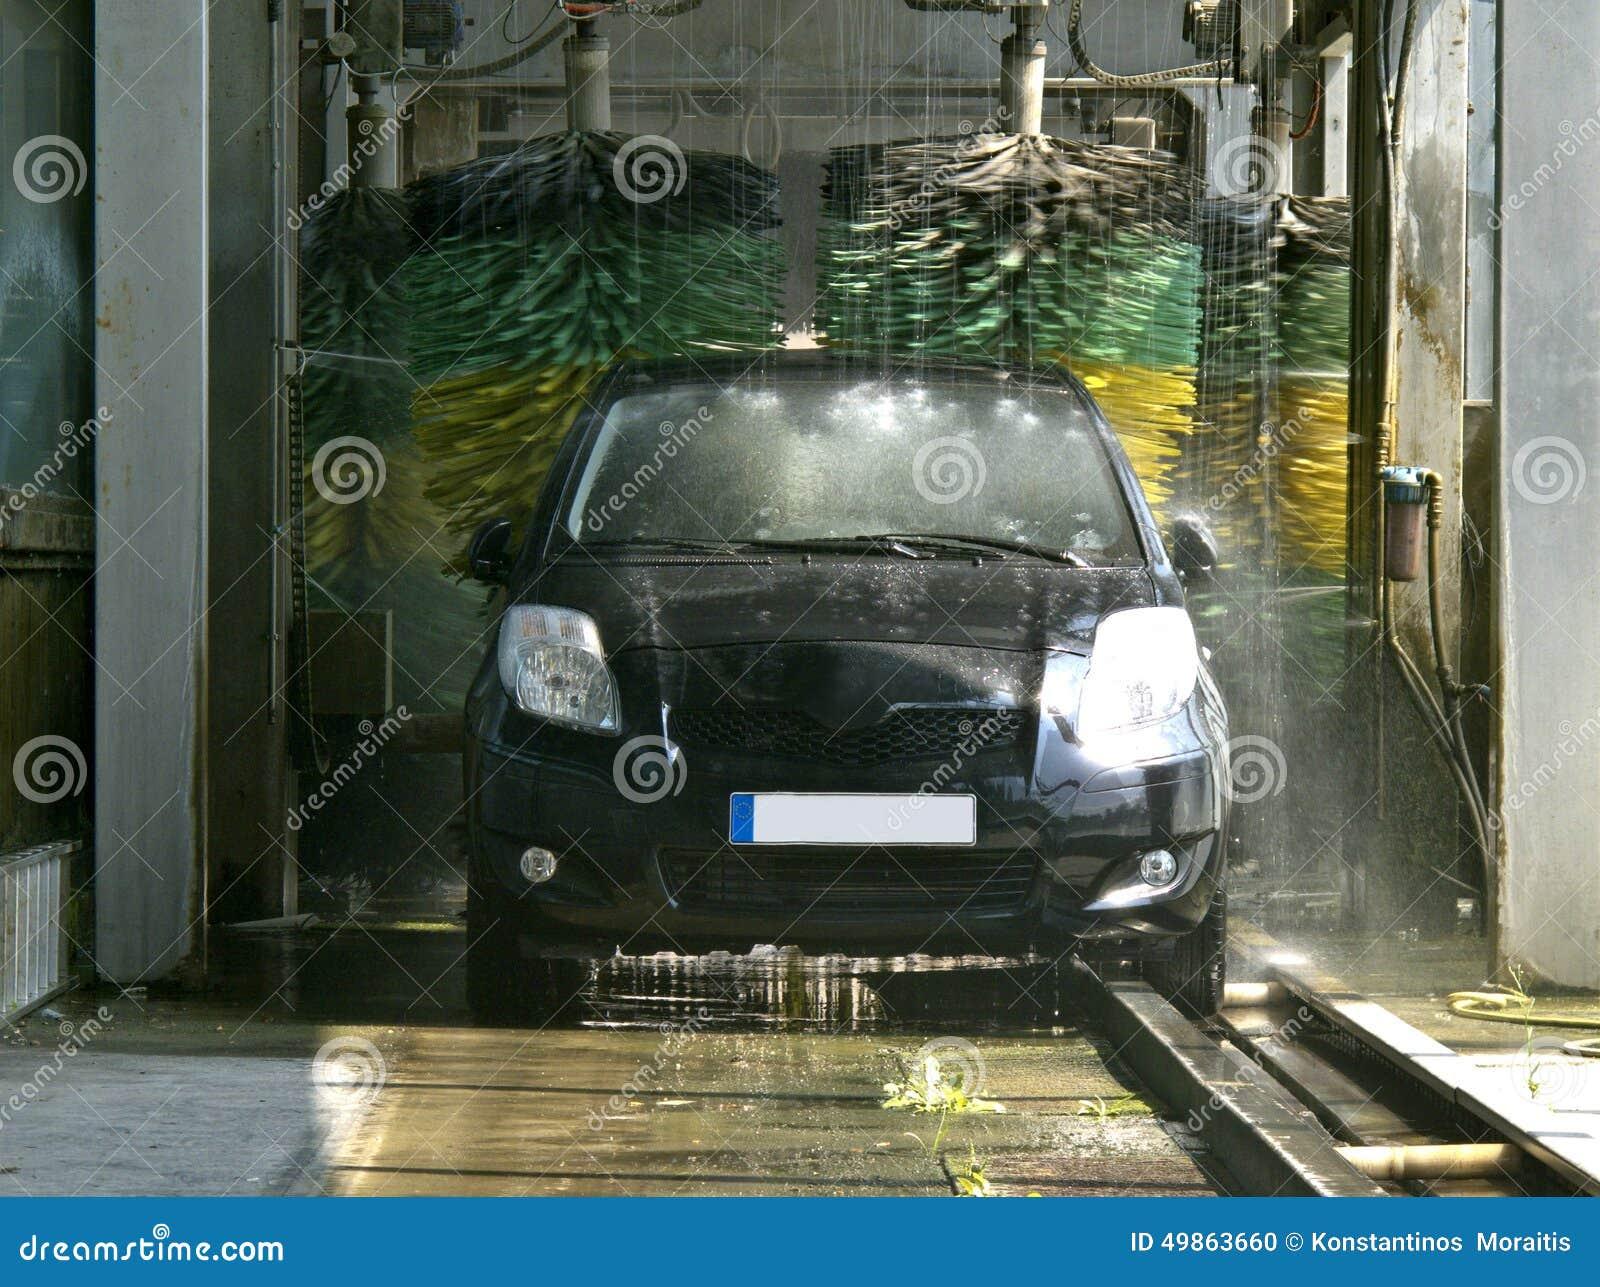 Car in car wash machine tunnel